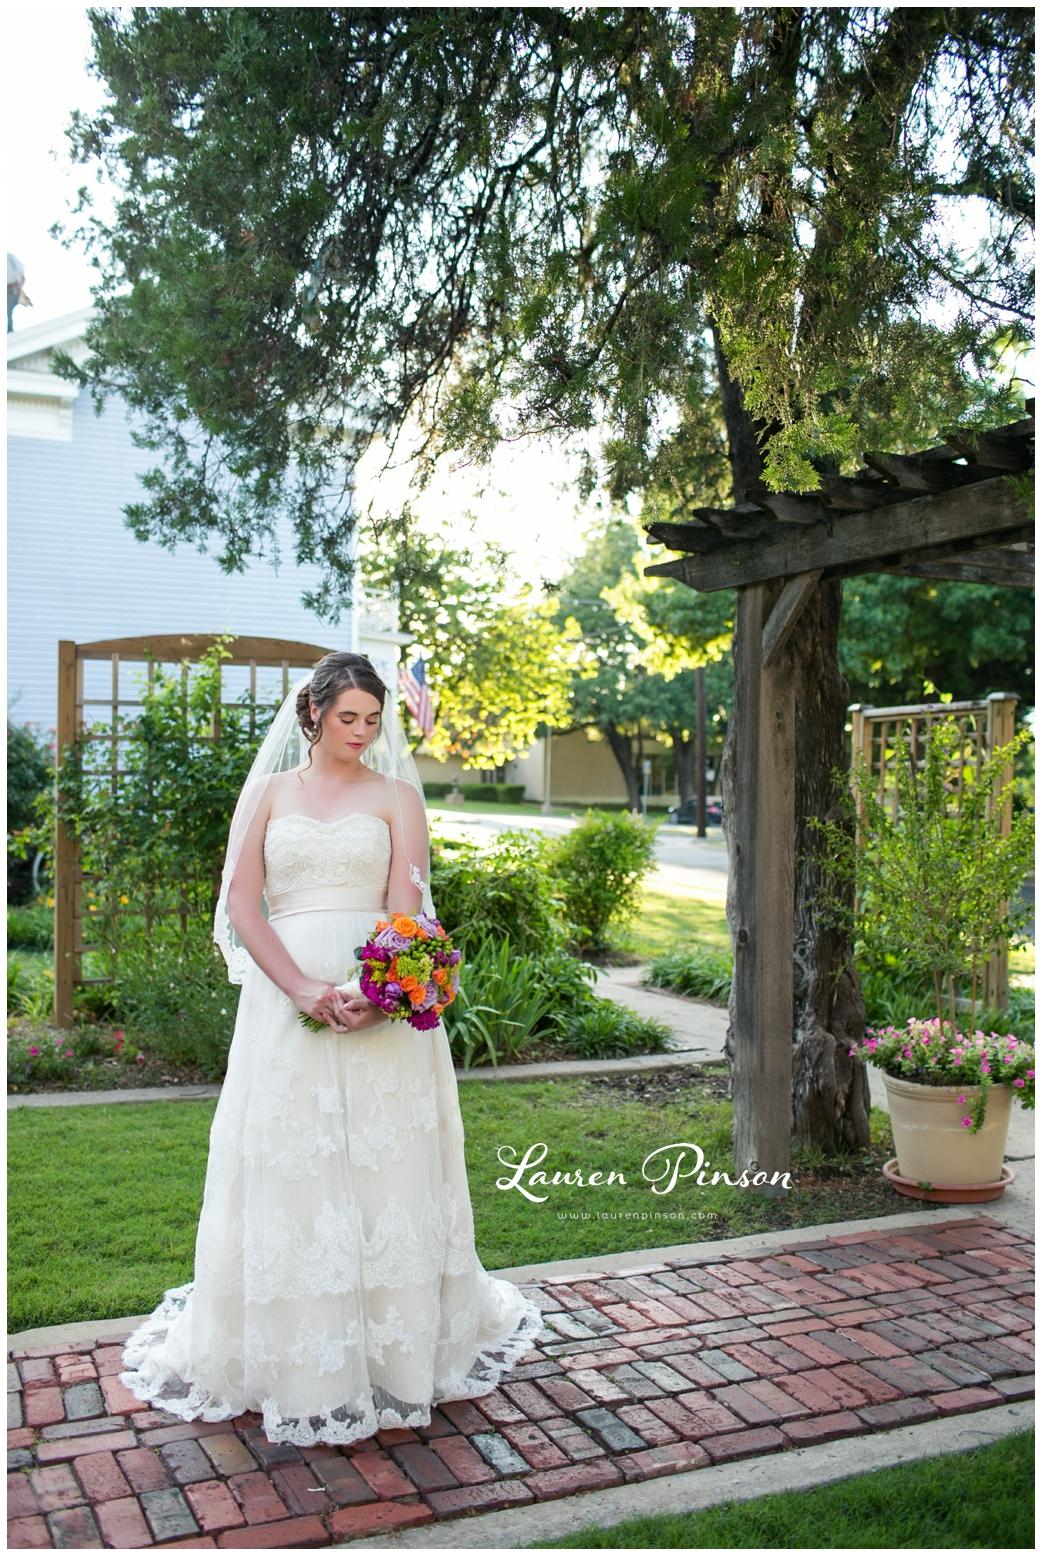 chestnut-square-downtown-mckinney-texas-wedding-photographer-sherman-northtexas-bridal-portraits-photography_0221.jpg